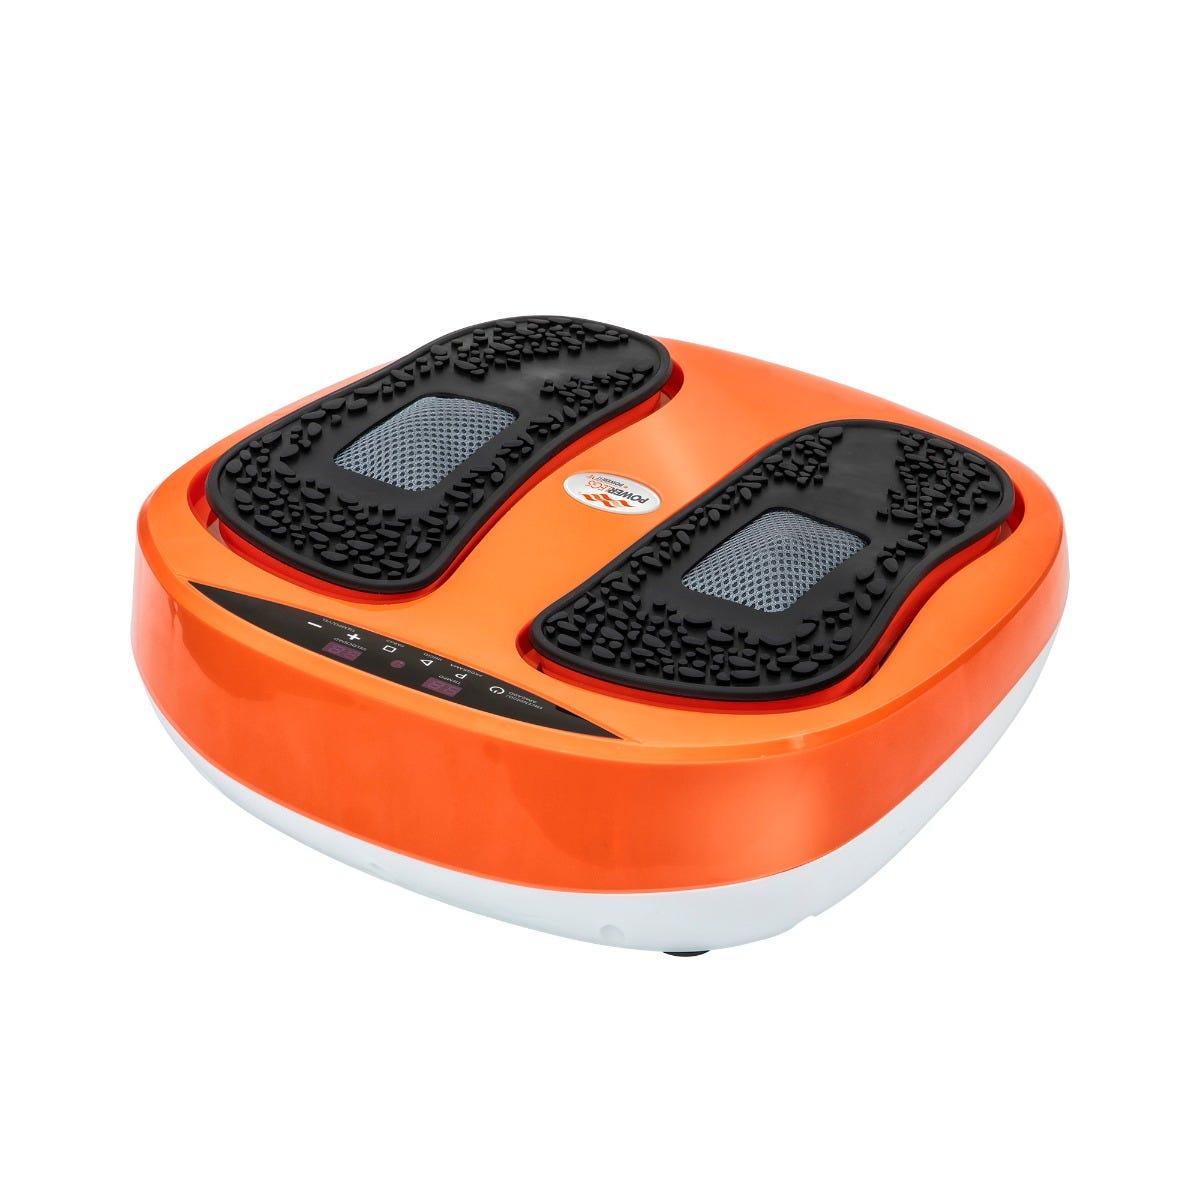 Masajeador eléctrico Homedics® Power Legs